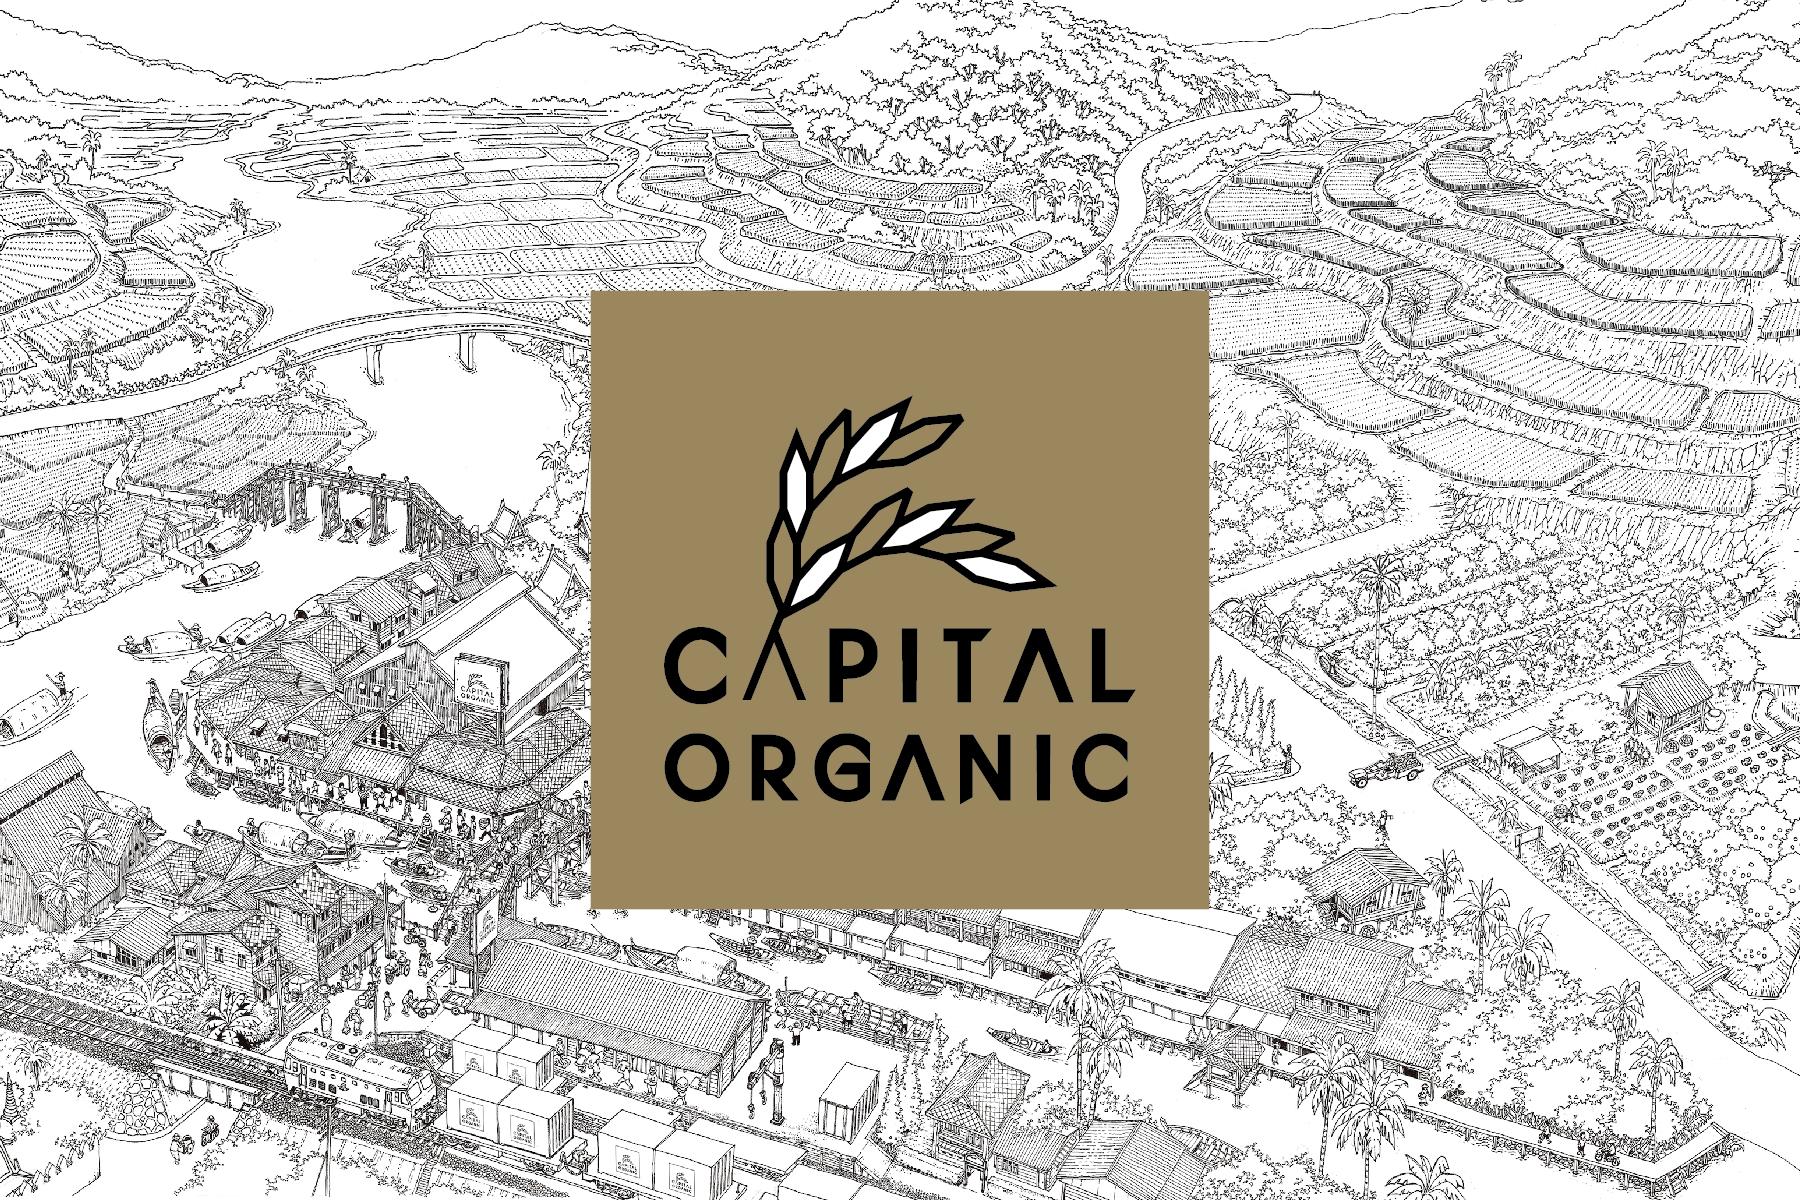 Capital organic